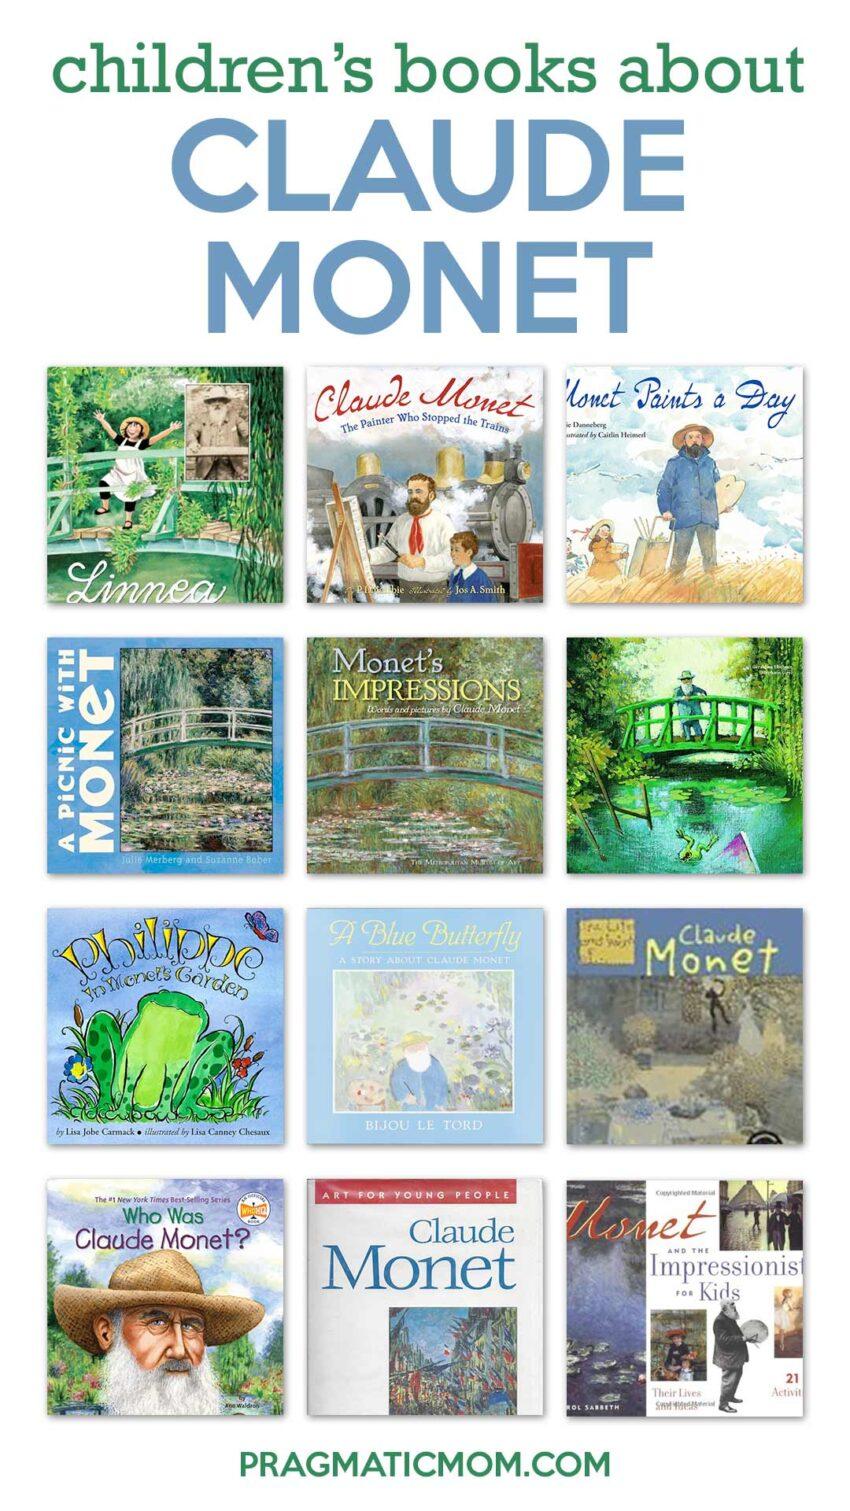 Children's Books about Claude Monet